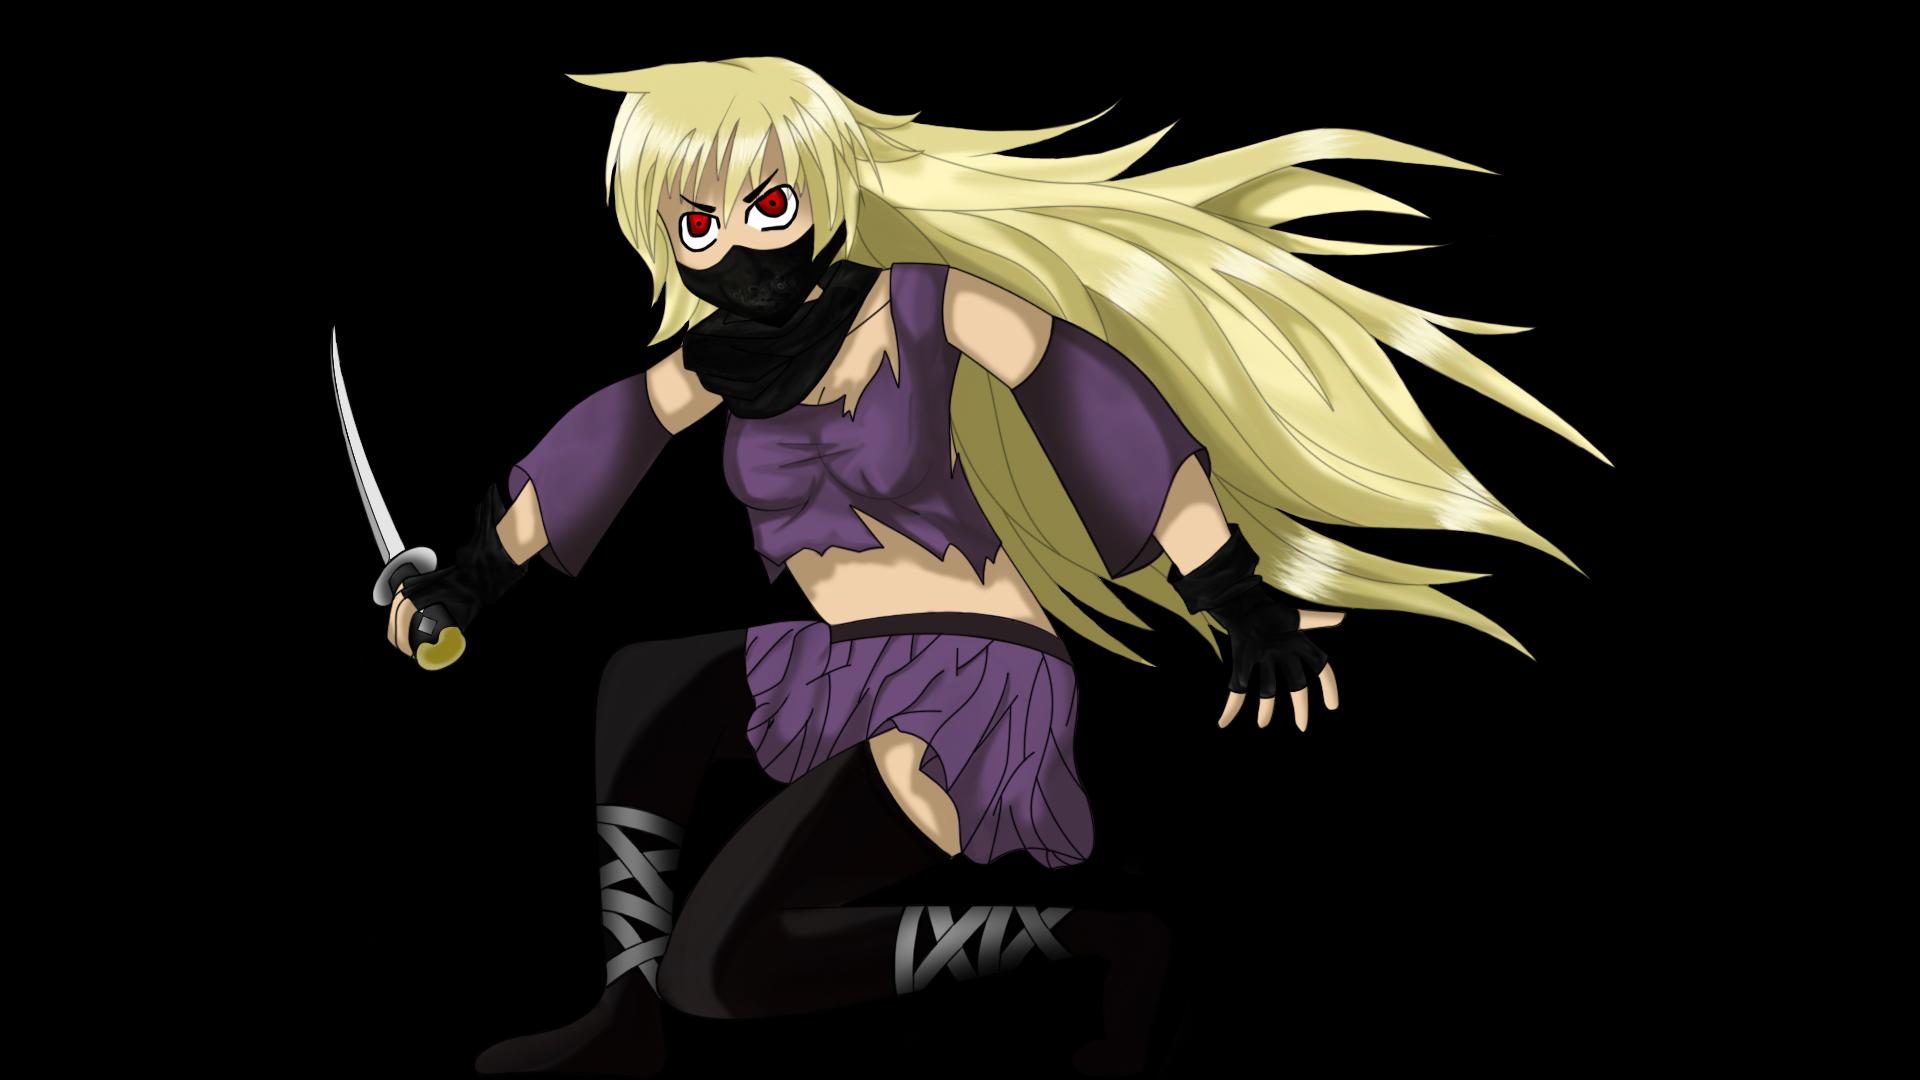 ninja assassin anime girl by mesa1337 on deviantart